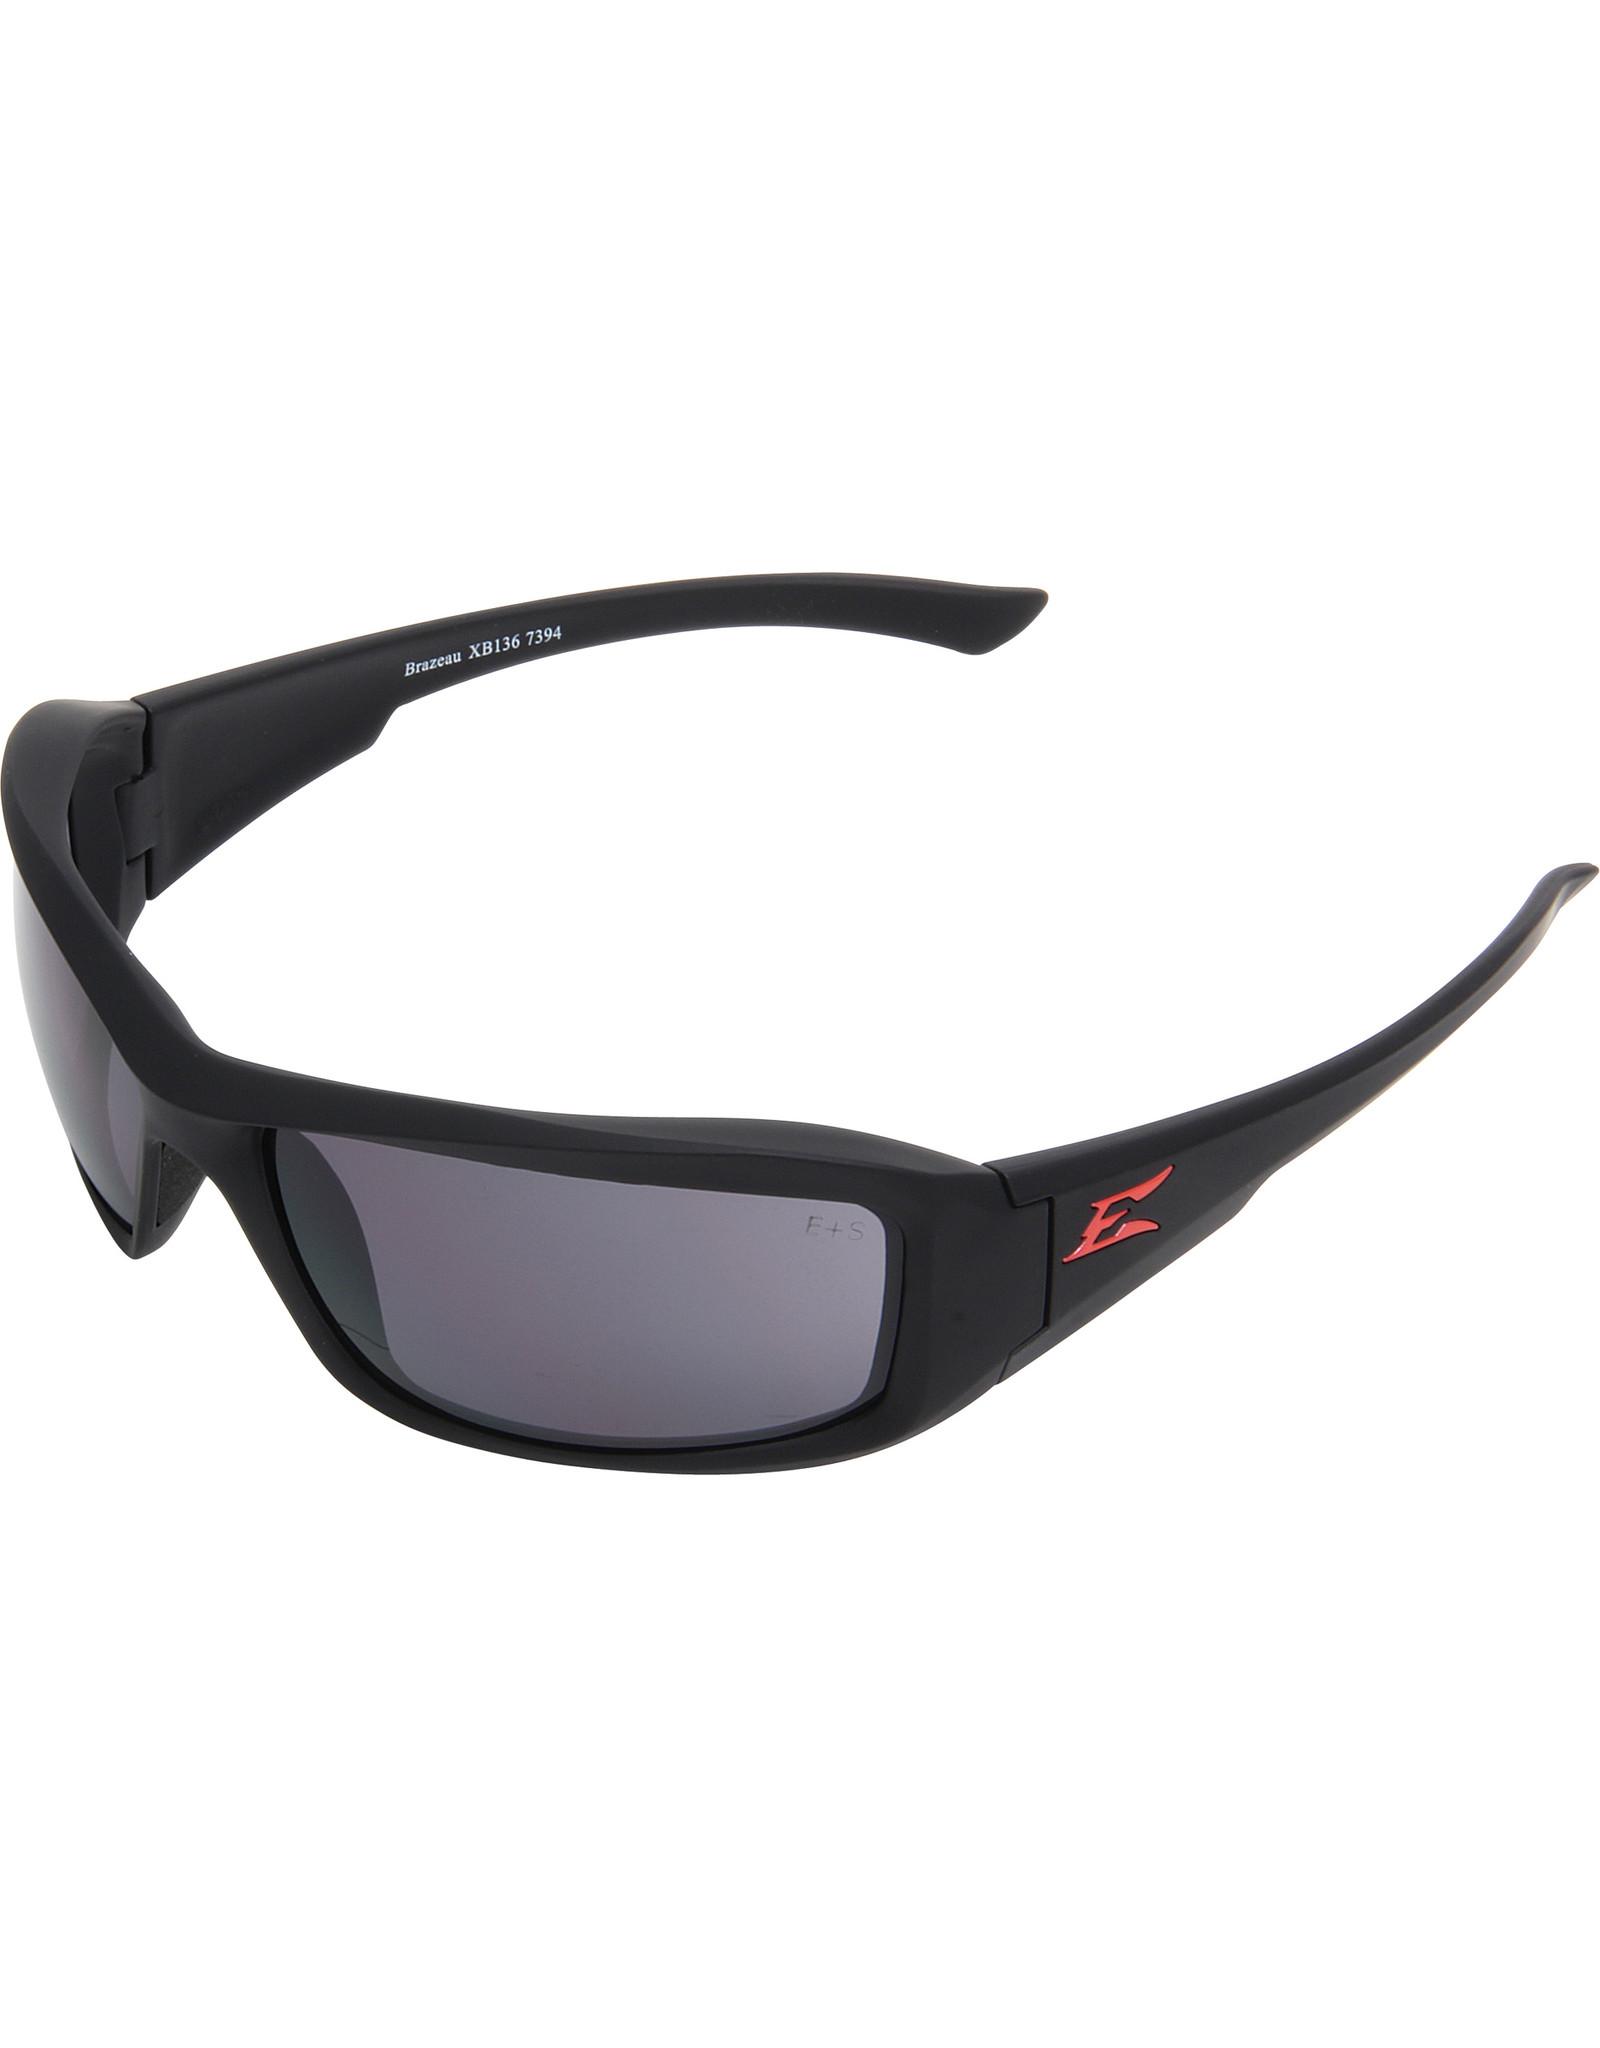 "Edge Edge Safety Sunglasses, Smoke w/Red ""E"""